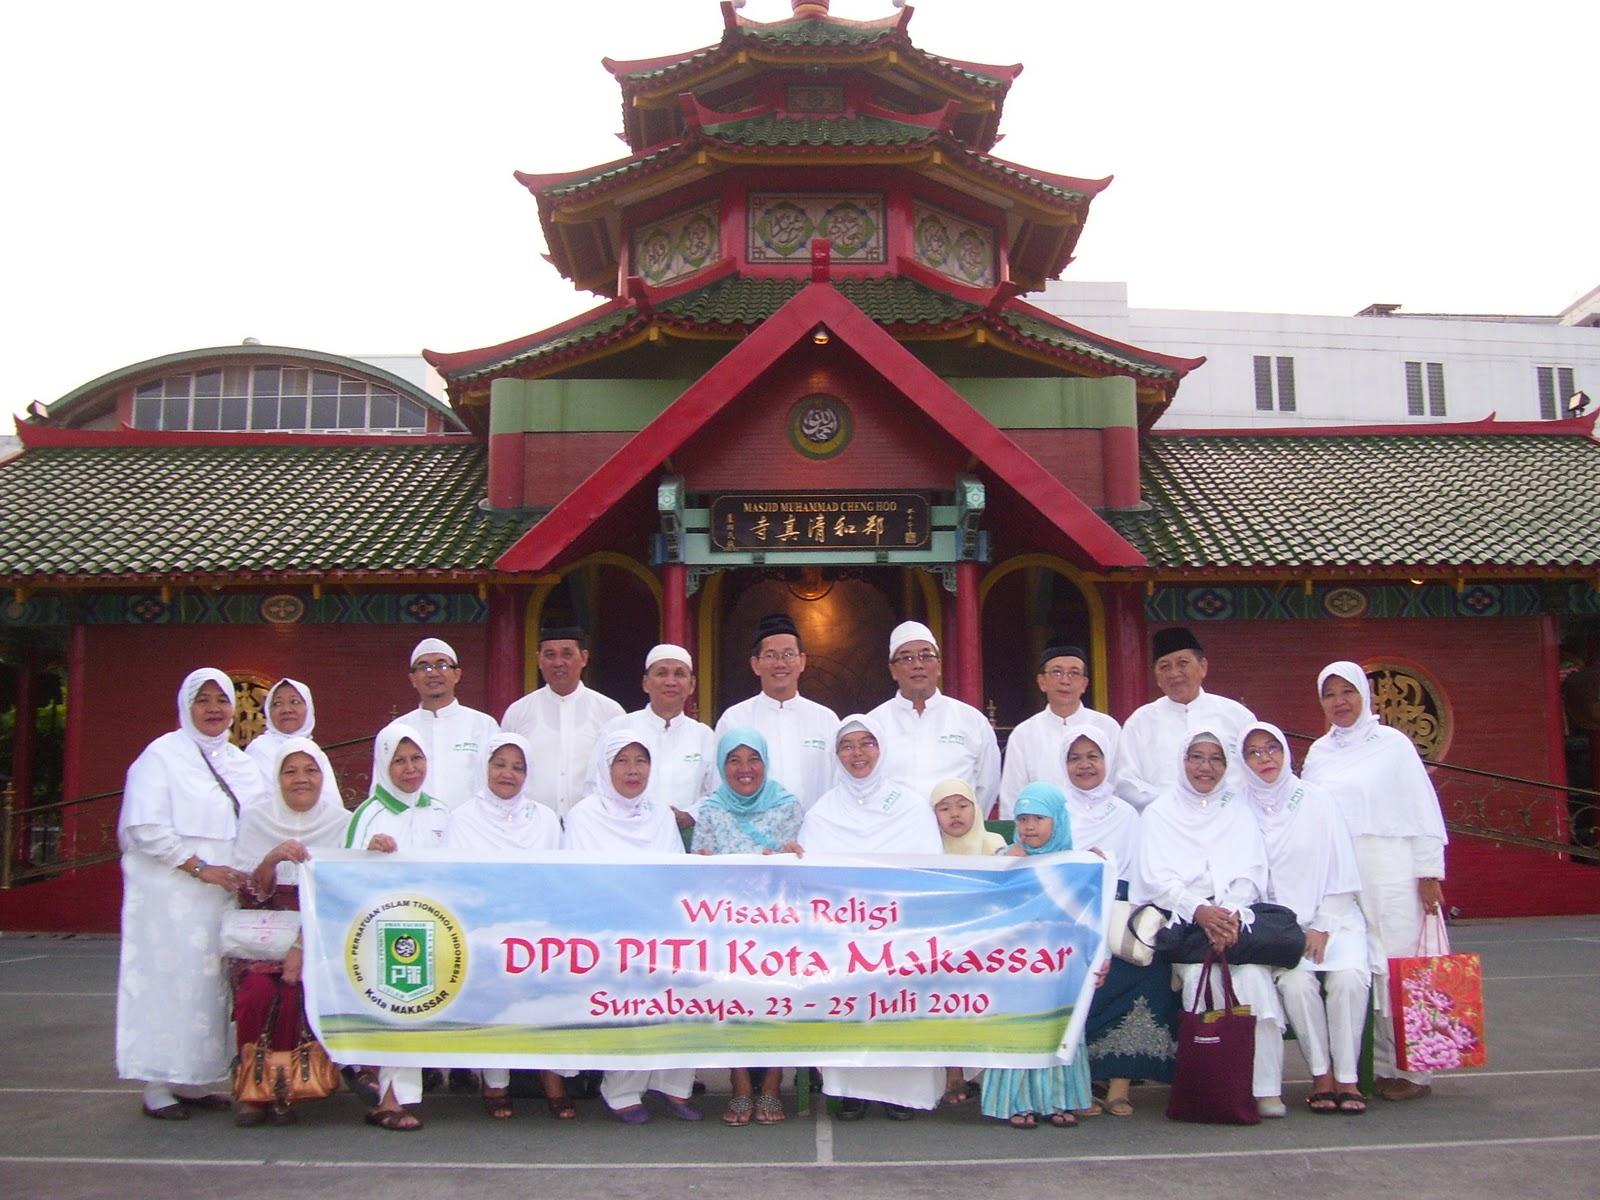 Dpd Piti Kota Makassar Wisata Religi Surabaya Kunjungan Dpw Jawa